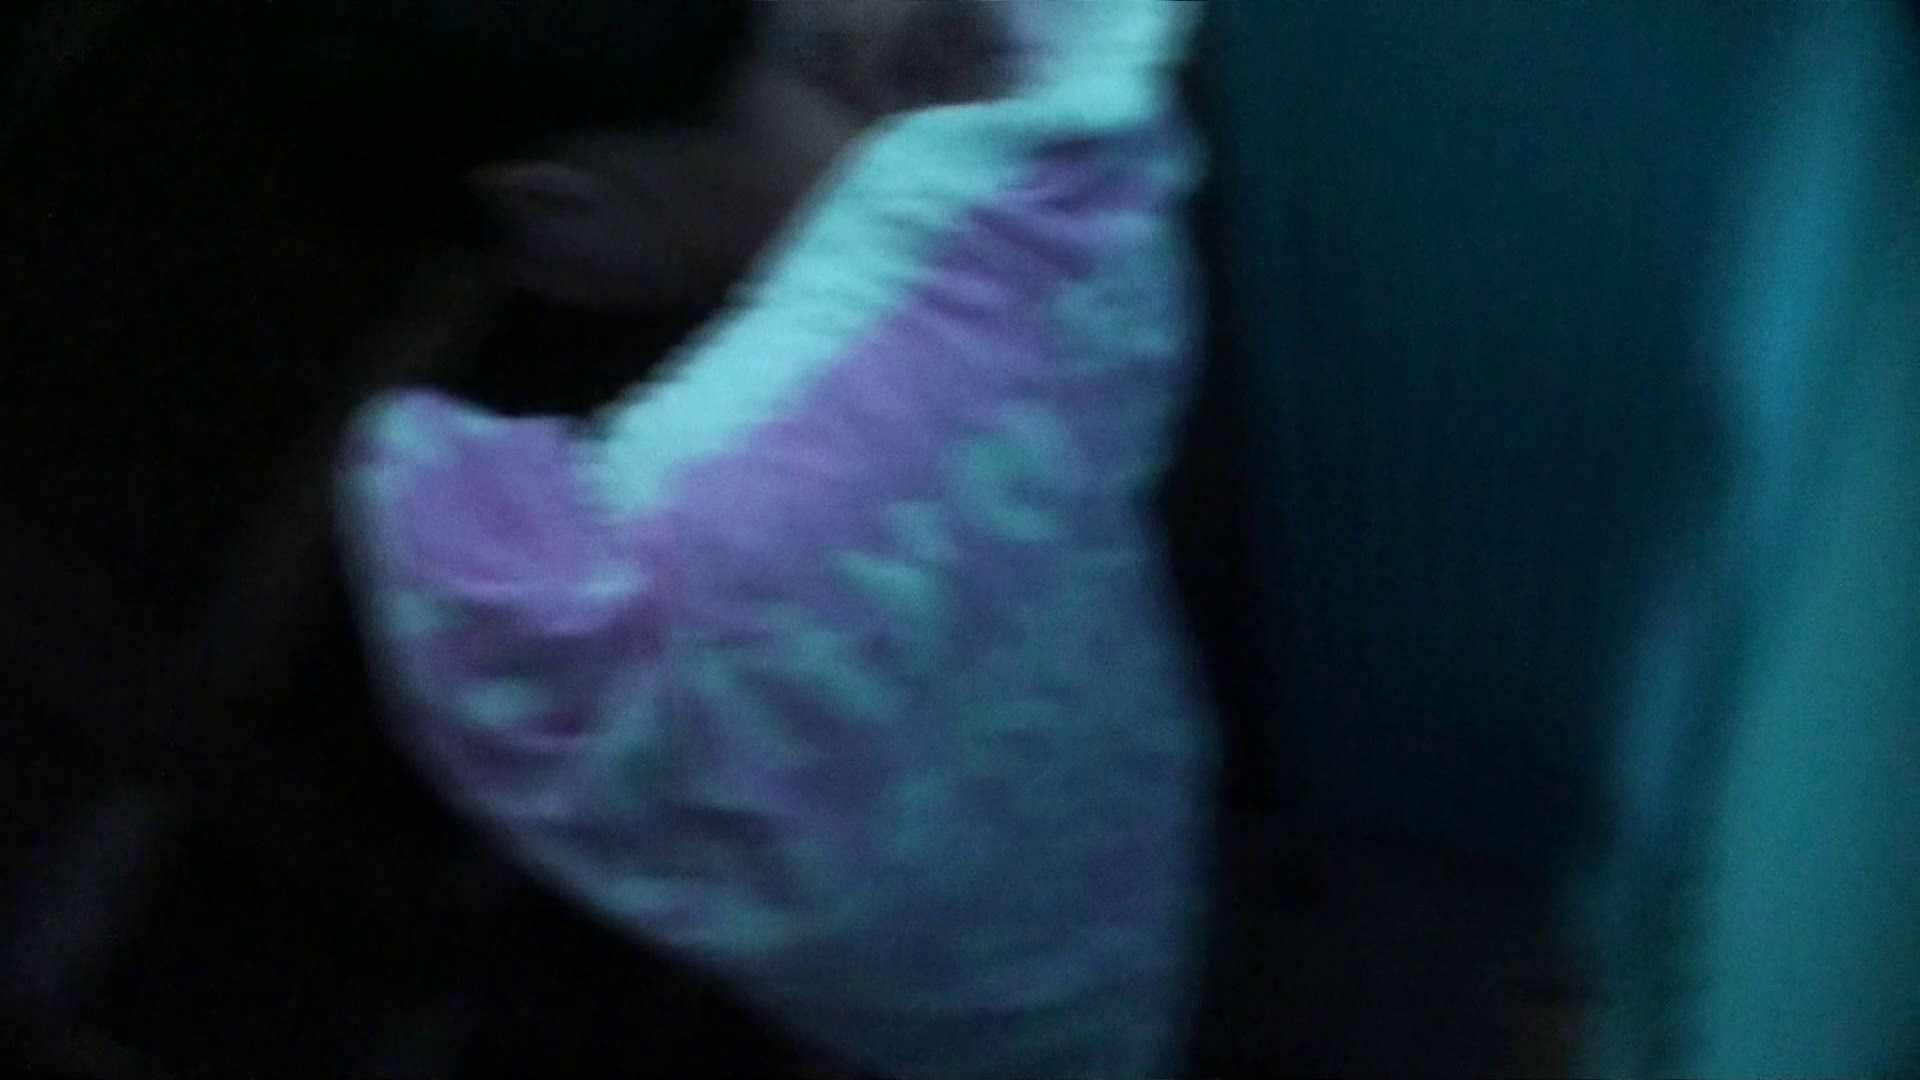 Vol.26 大学生風美形ギャル 暗さが残念! シャワーシーン オマンコ無修正動画無料 71連発 20